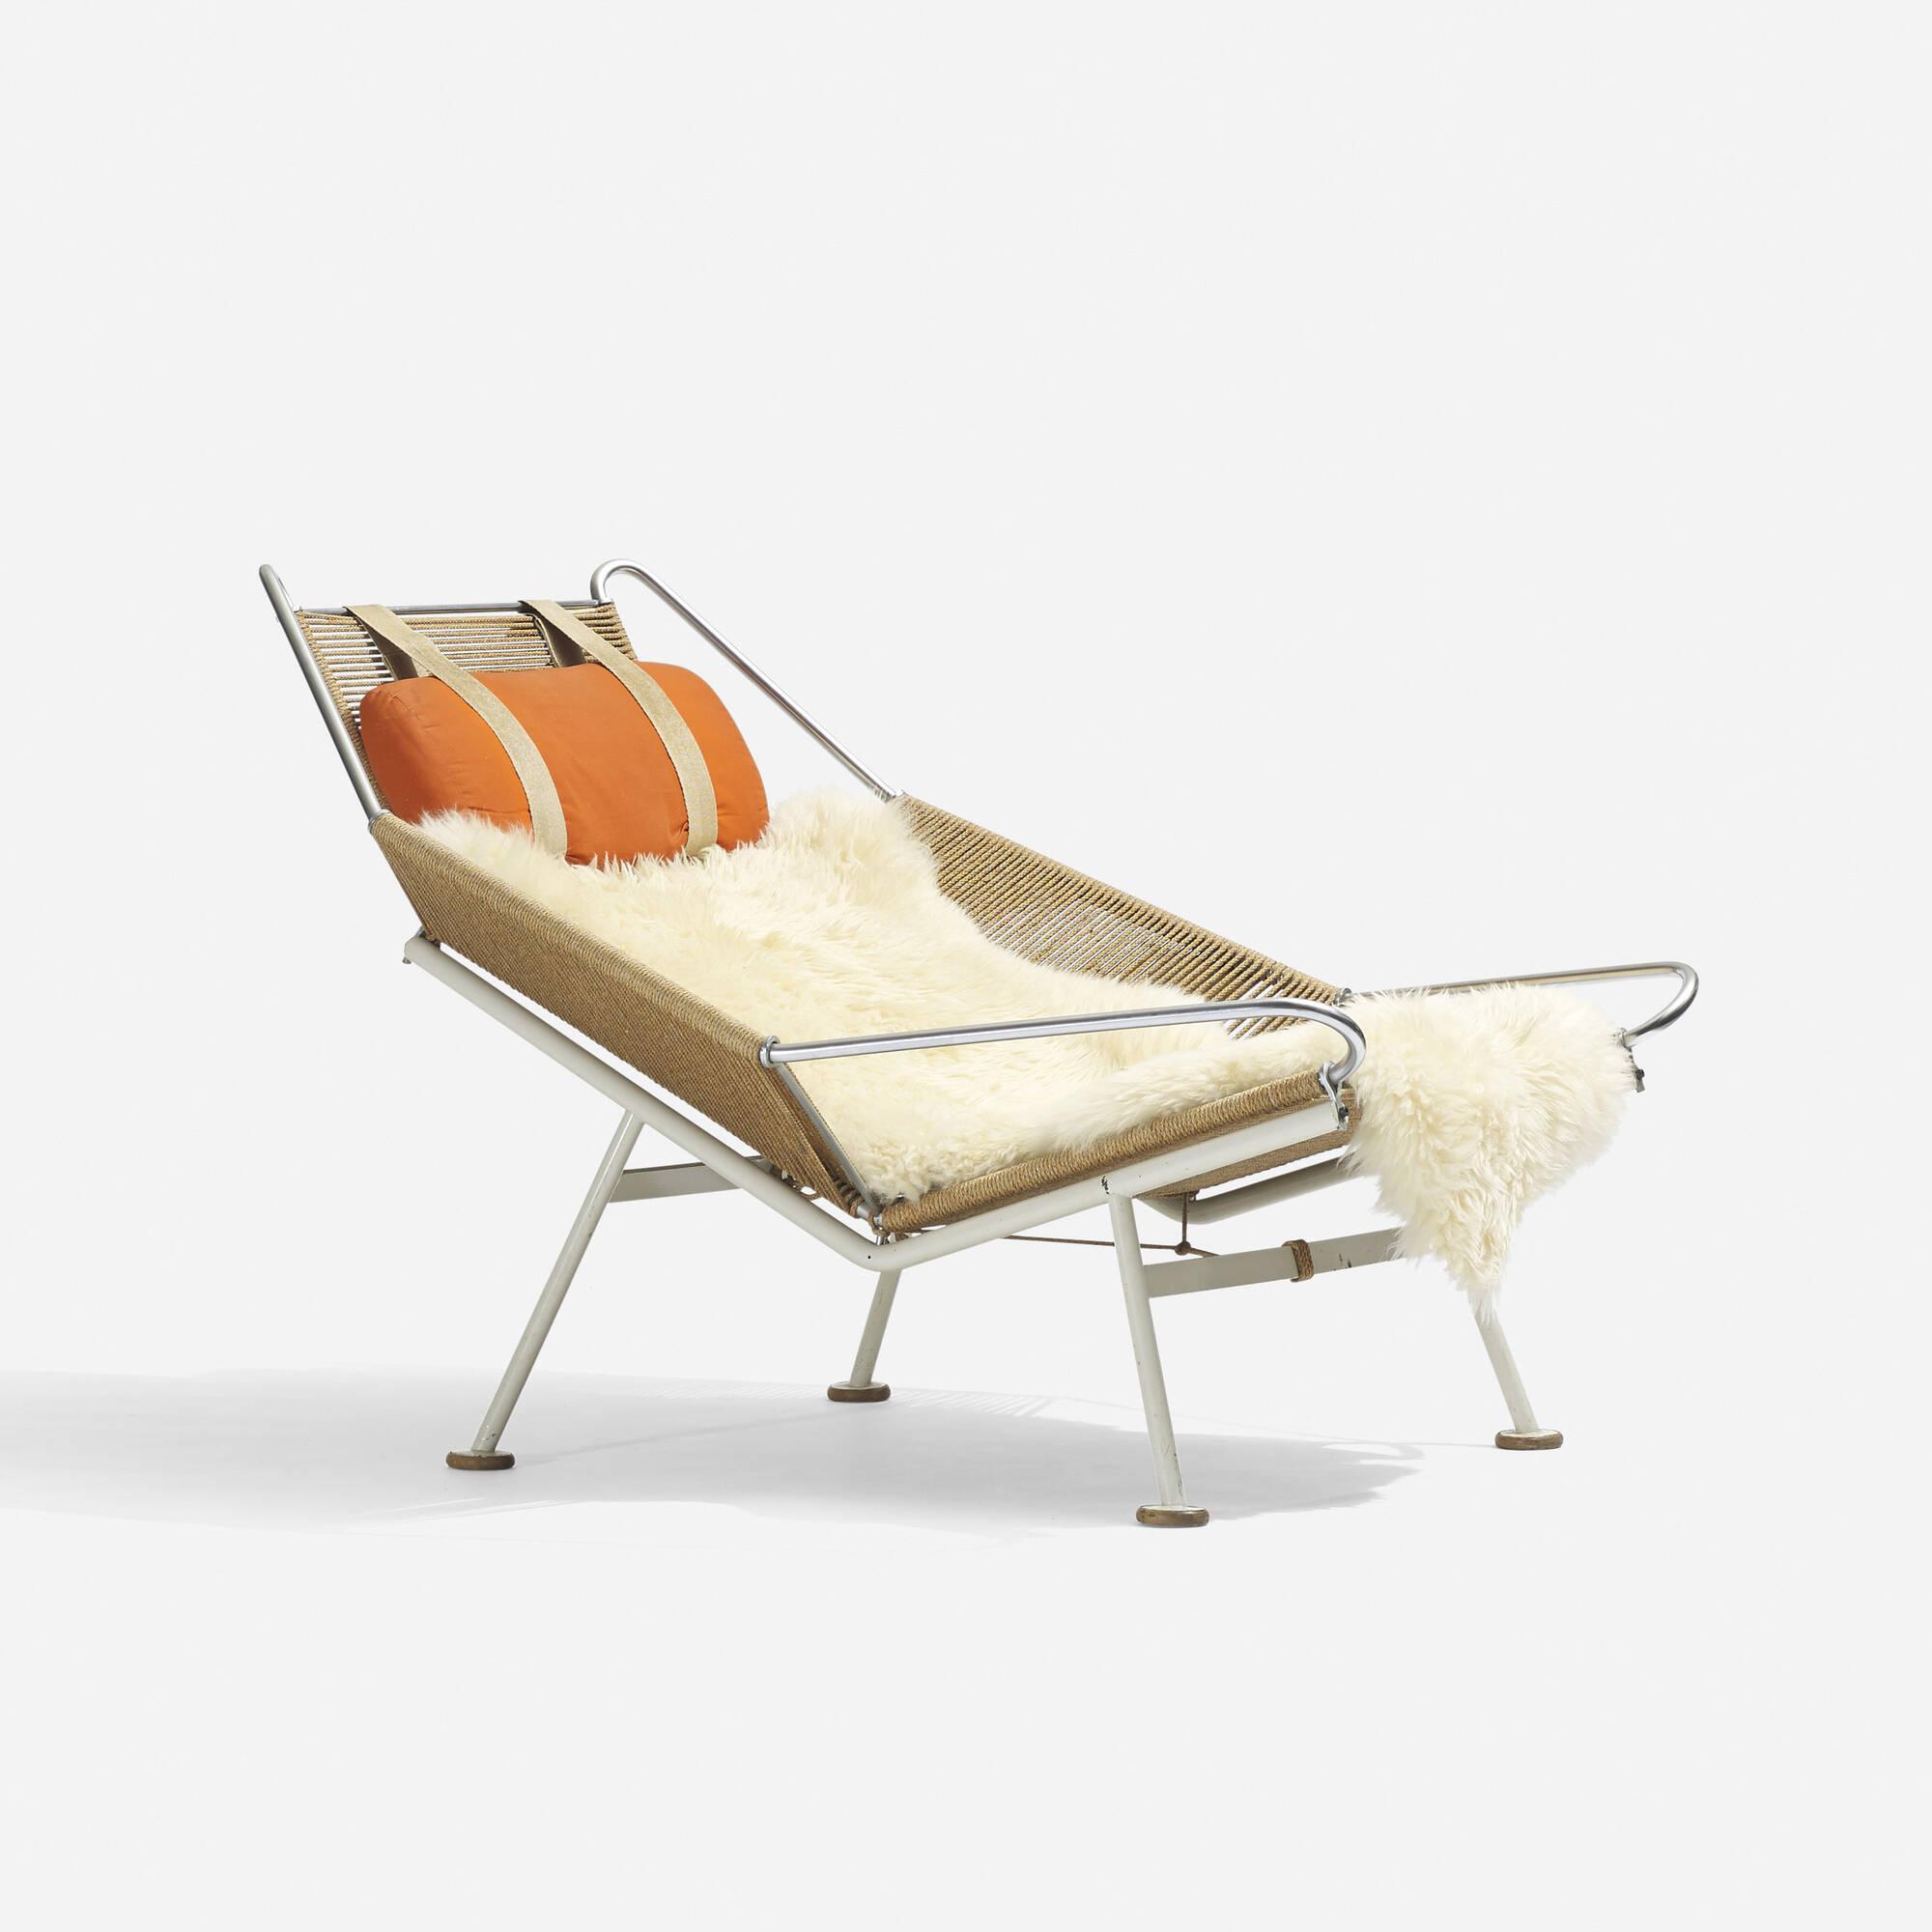 182: Hans J. Wegner / Flag Halyard Lounge Chair (1 Of 4)